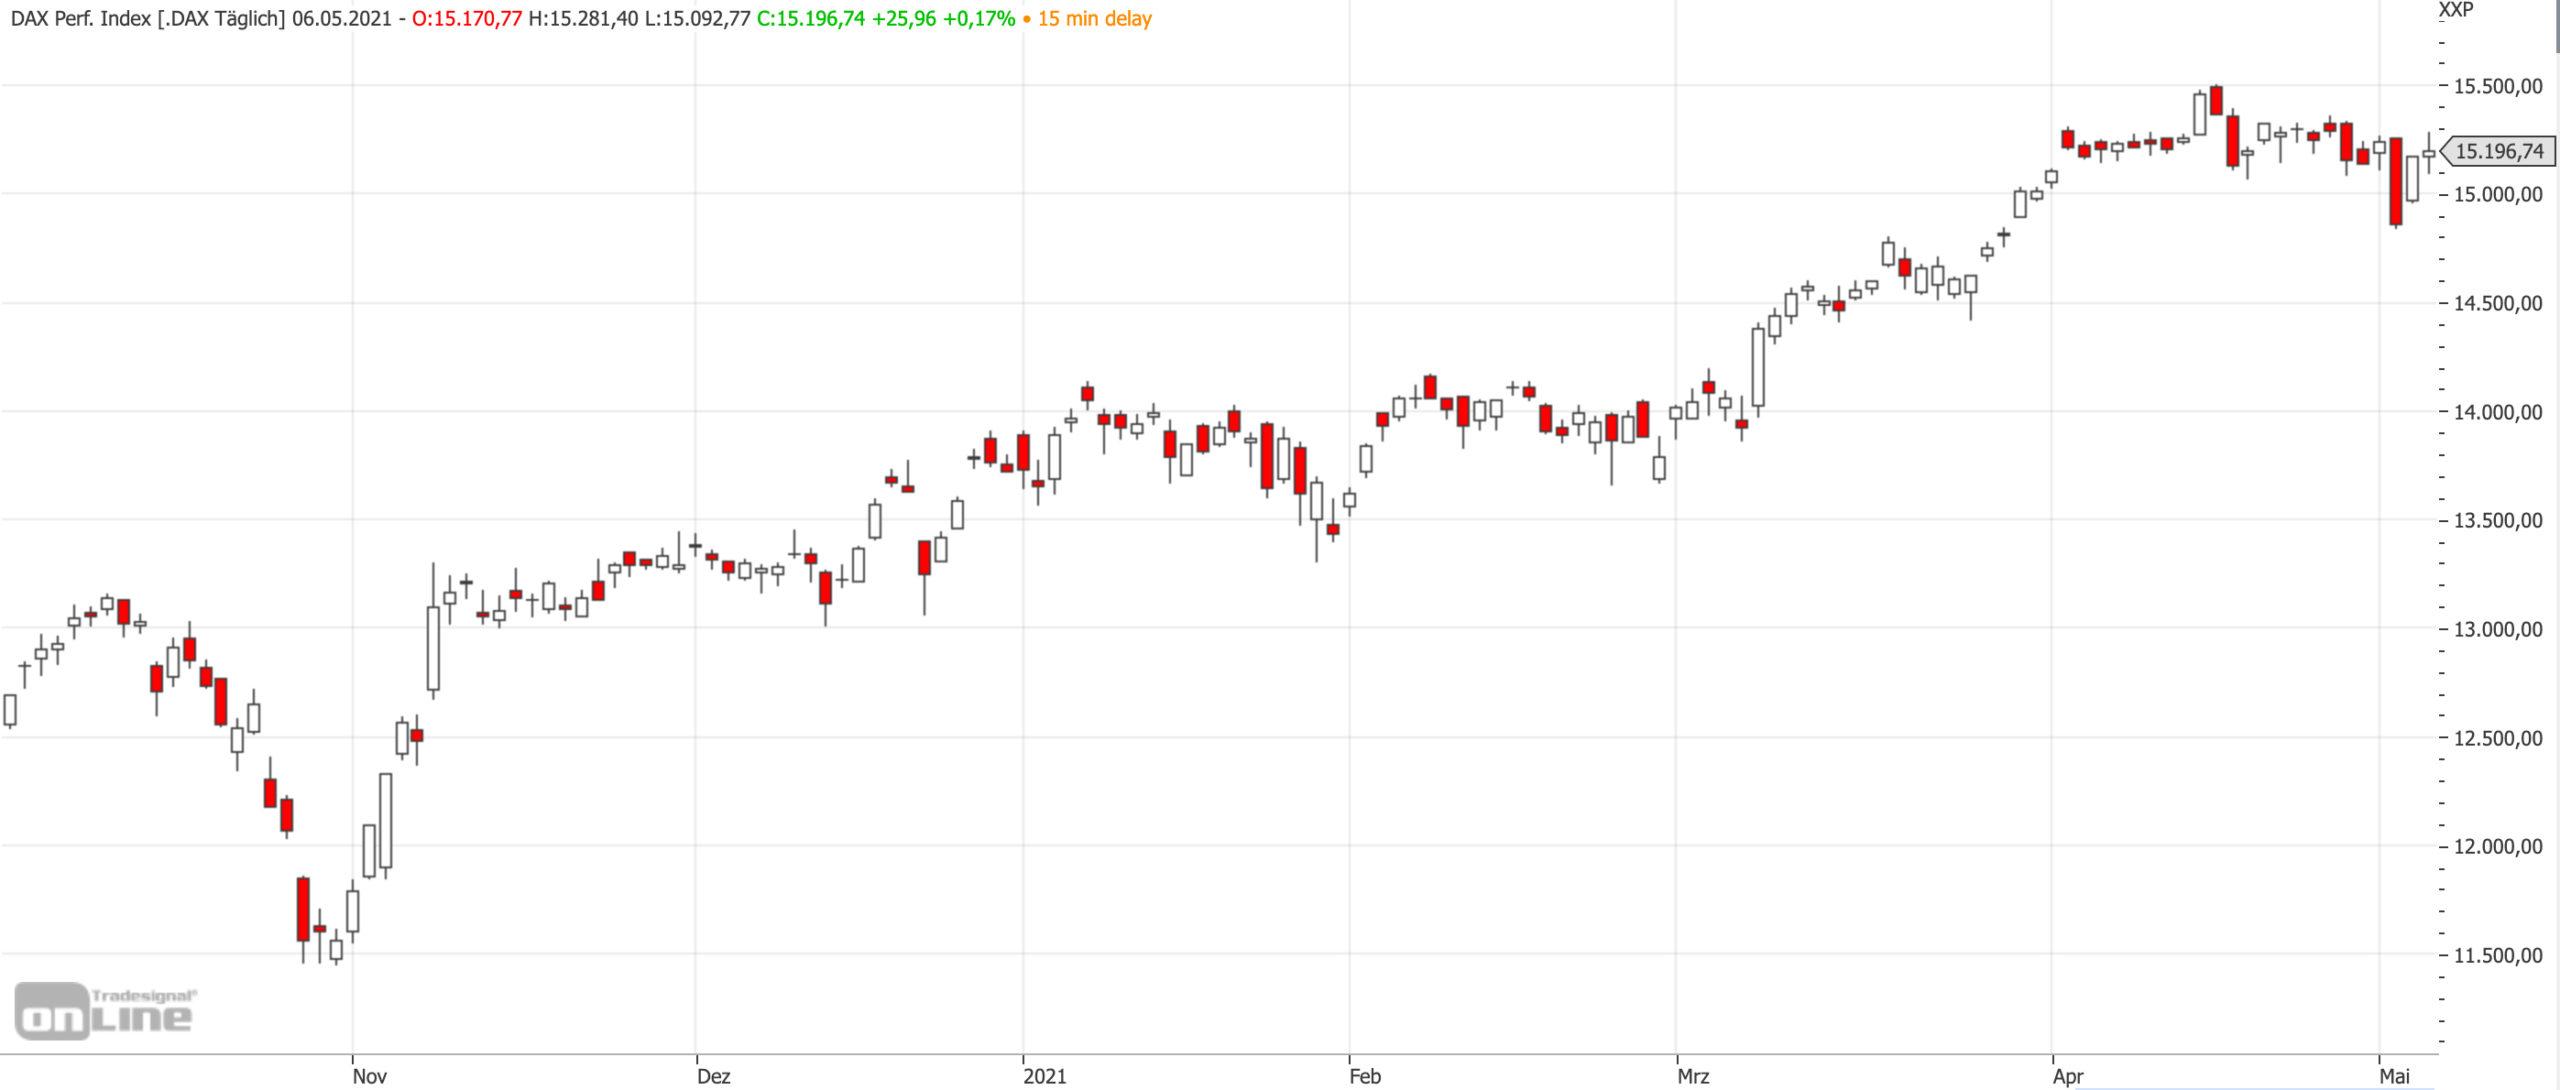 Mittelfristiger DAX-Chart am 06.05.2021